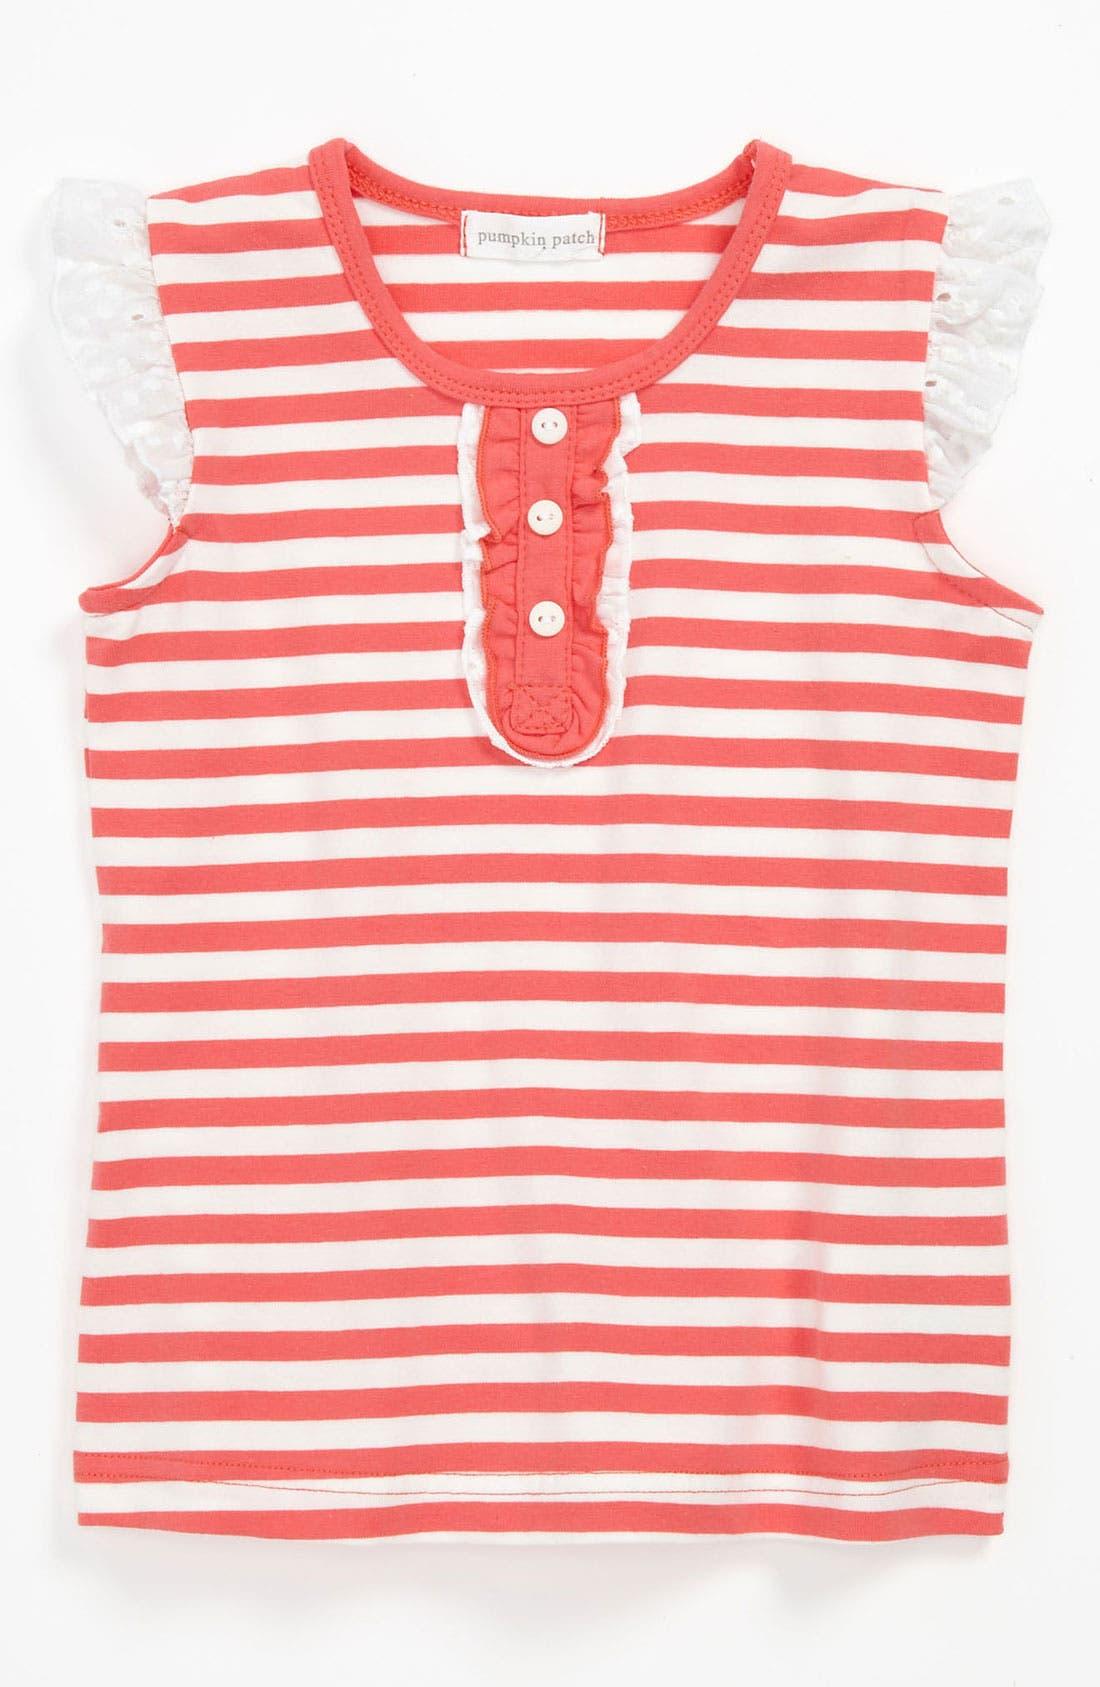 Alternate Image 1 Selected - Pumpkin Patch Skinny Stripe Top (Toddler)